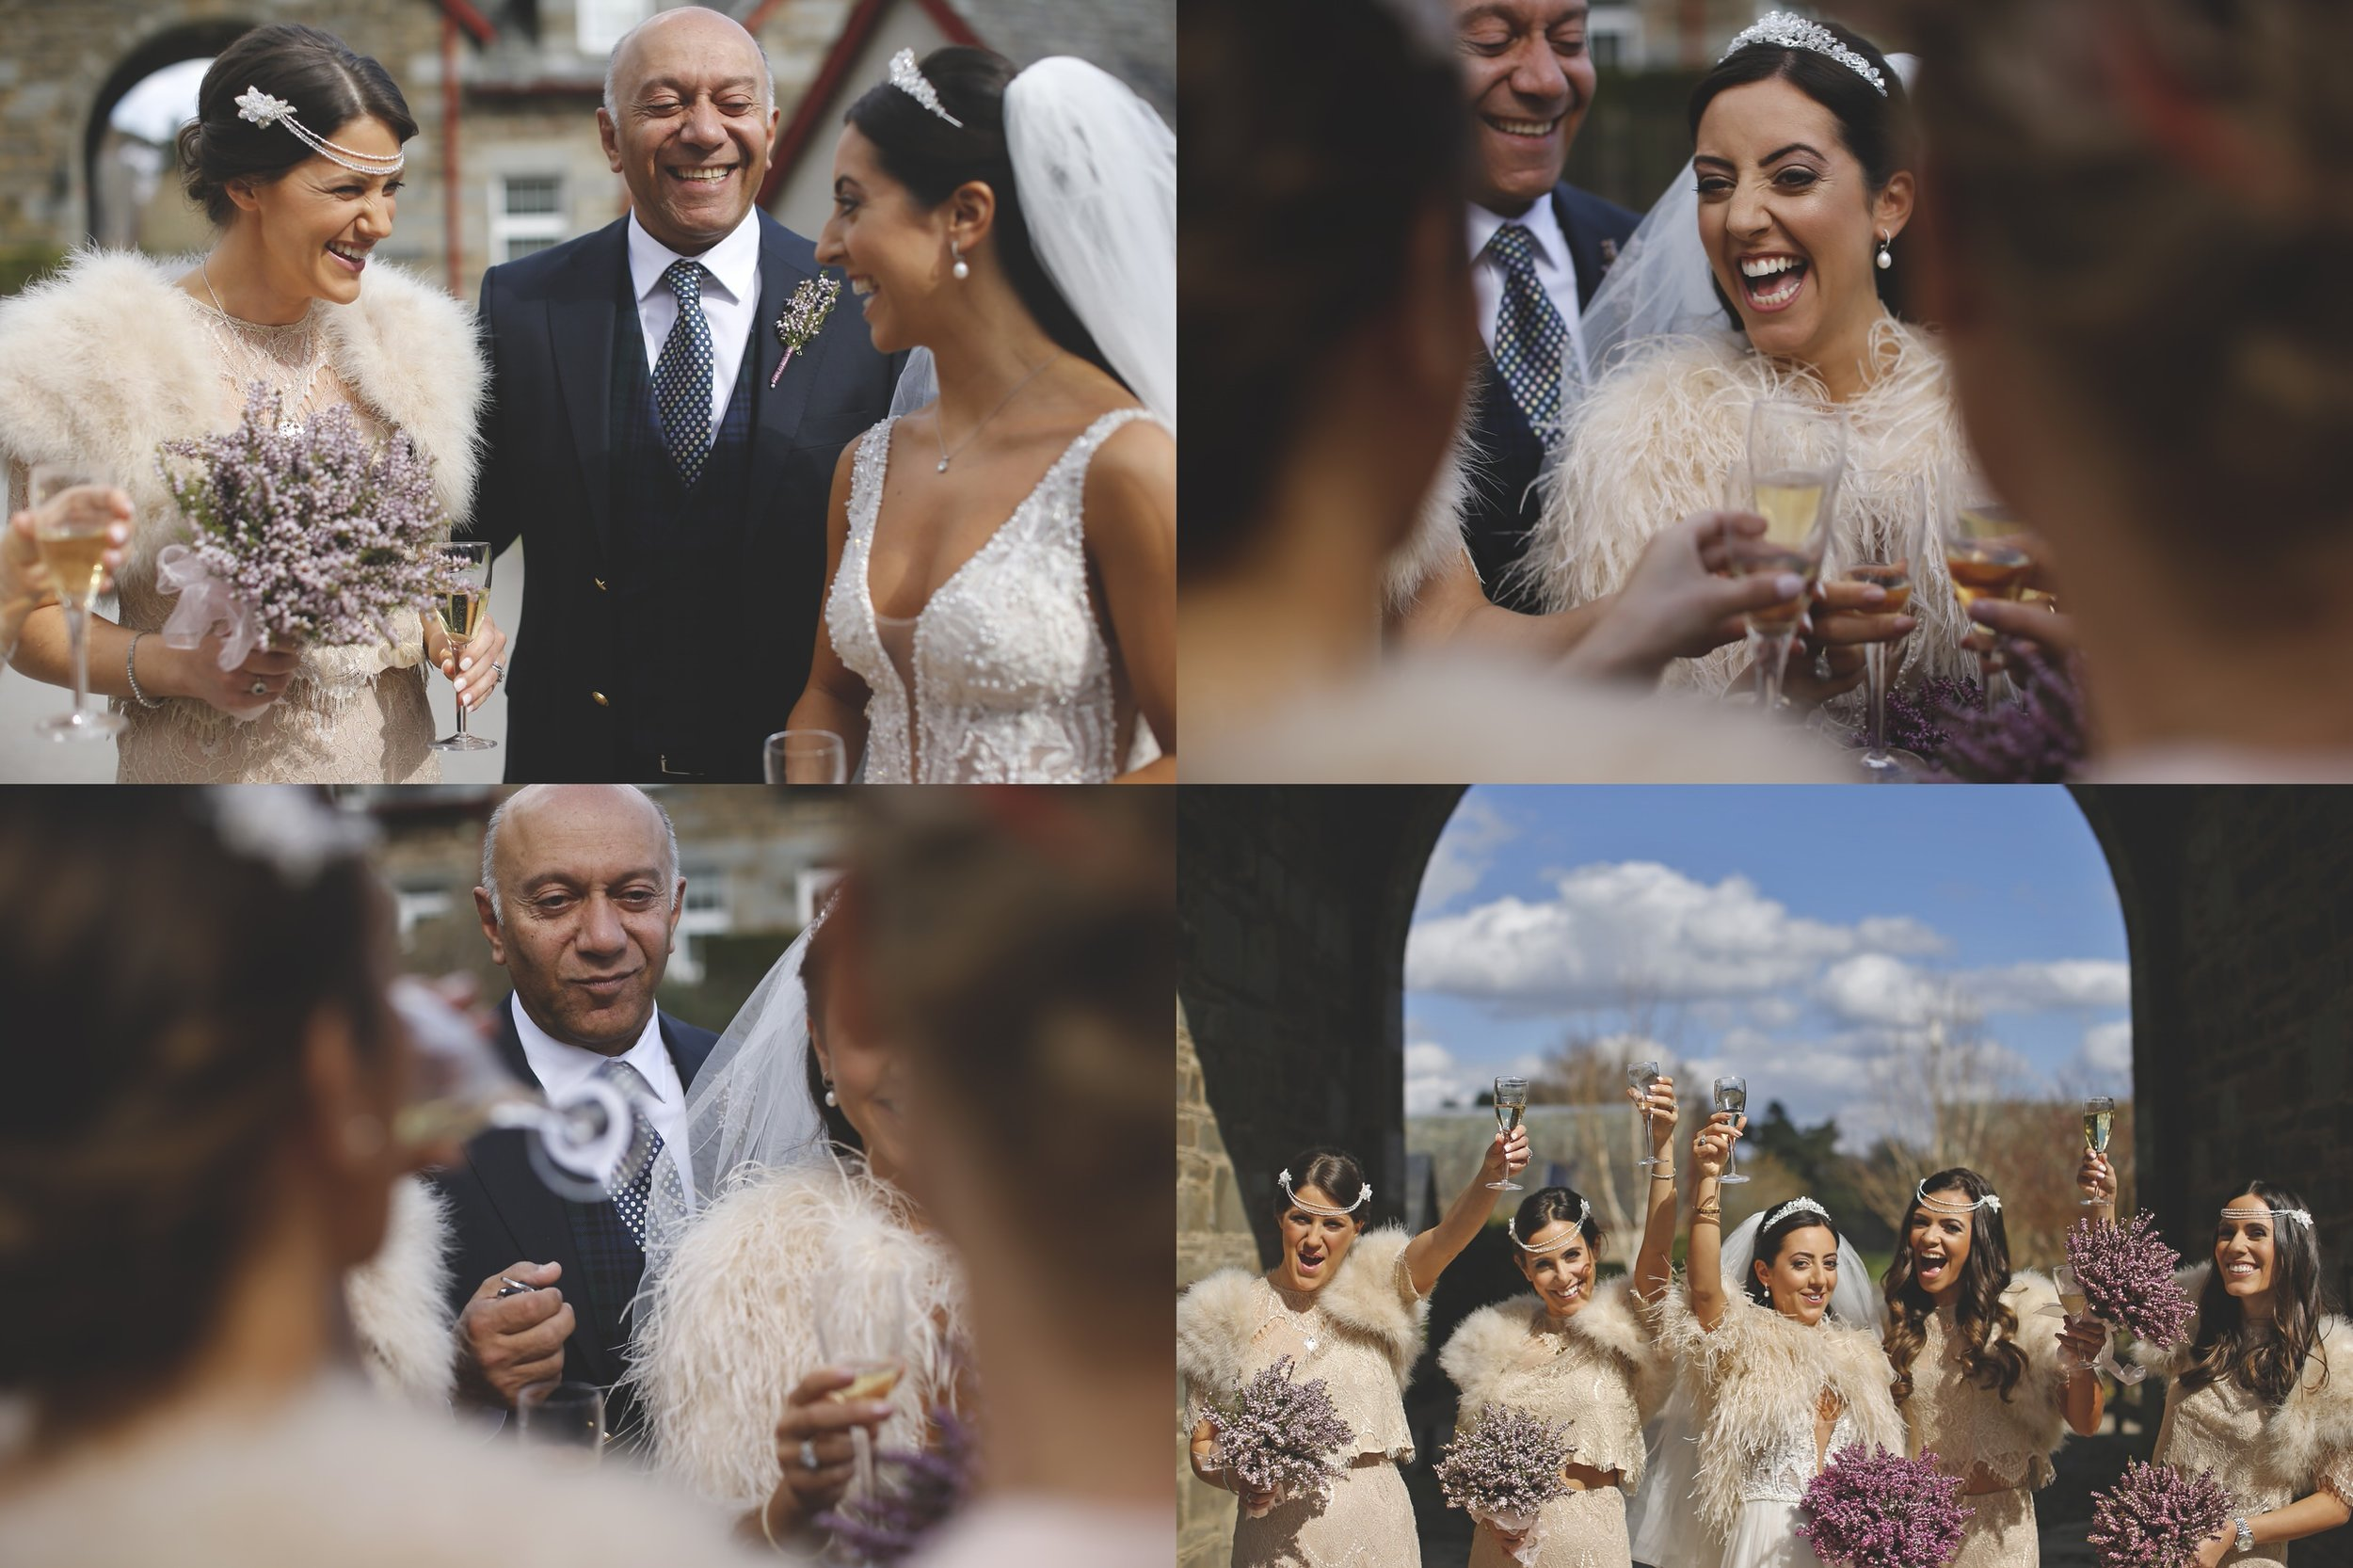 brett-harkness-cotland-wedding-photographer-highland-wedding_0011.jpg